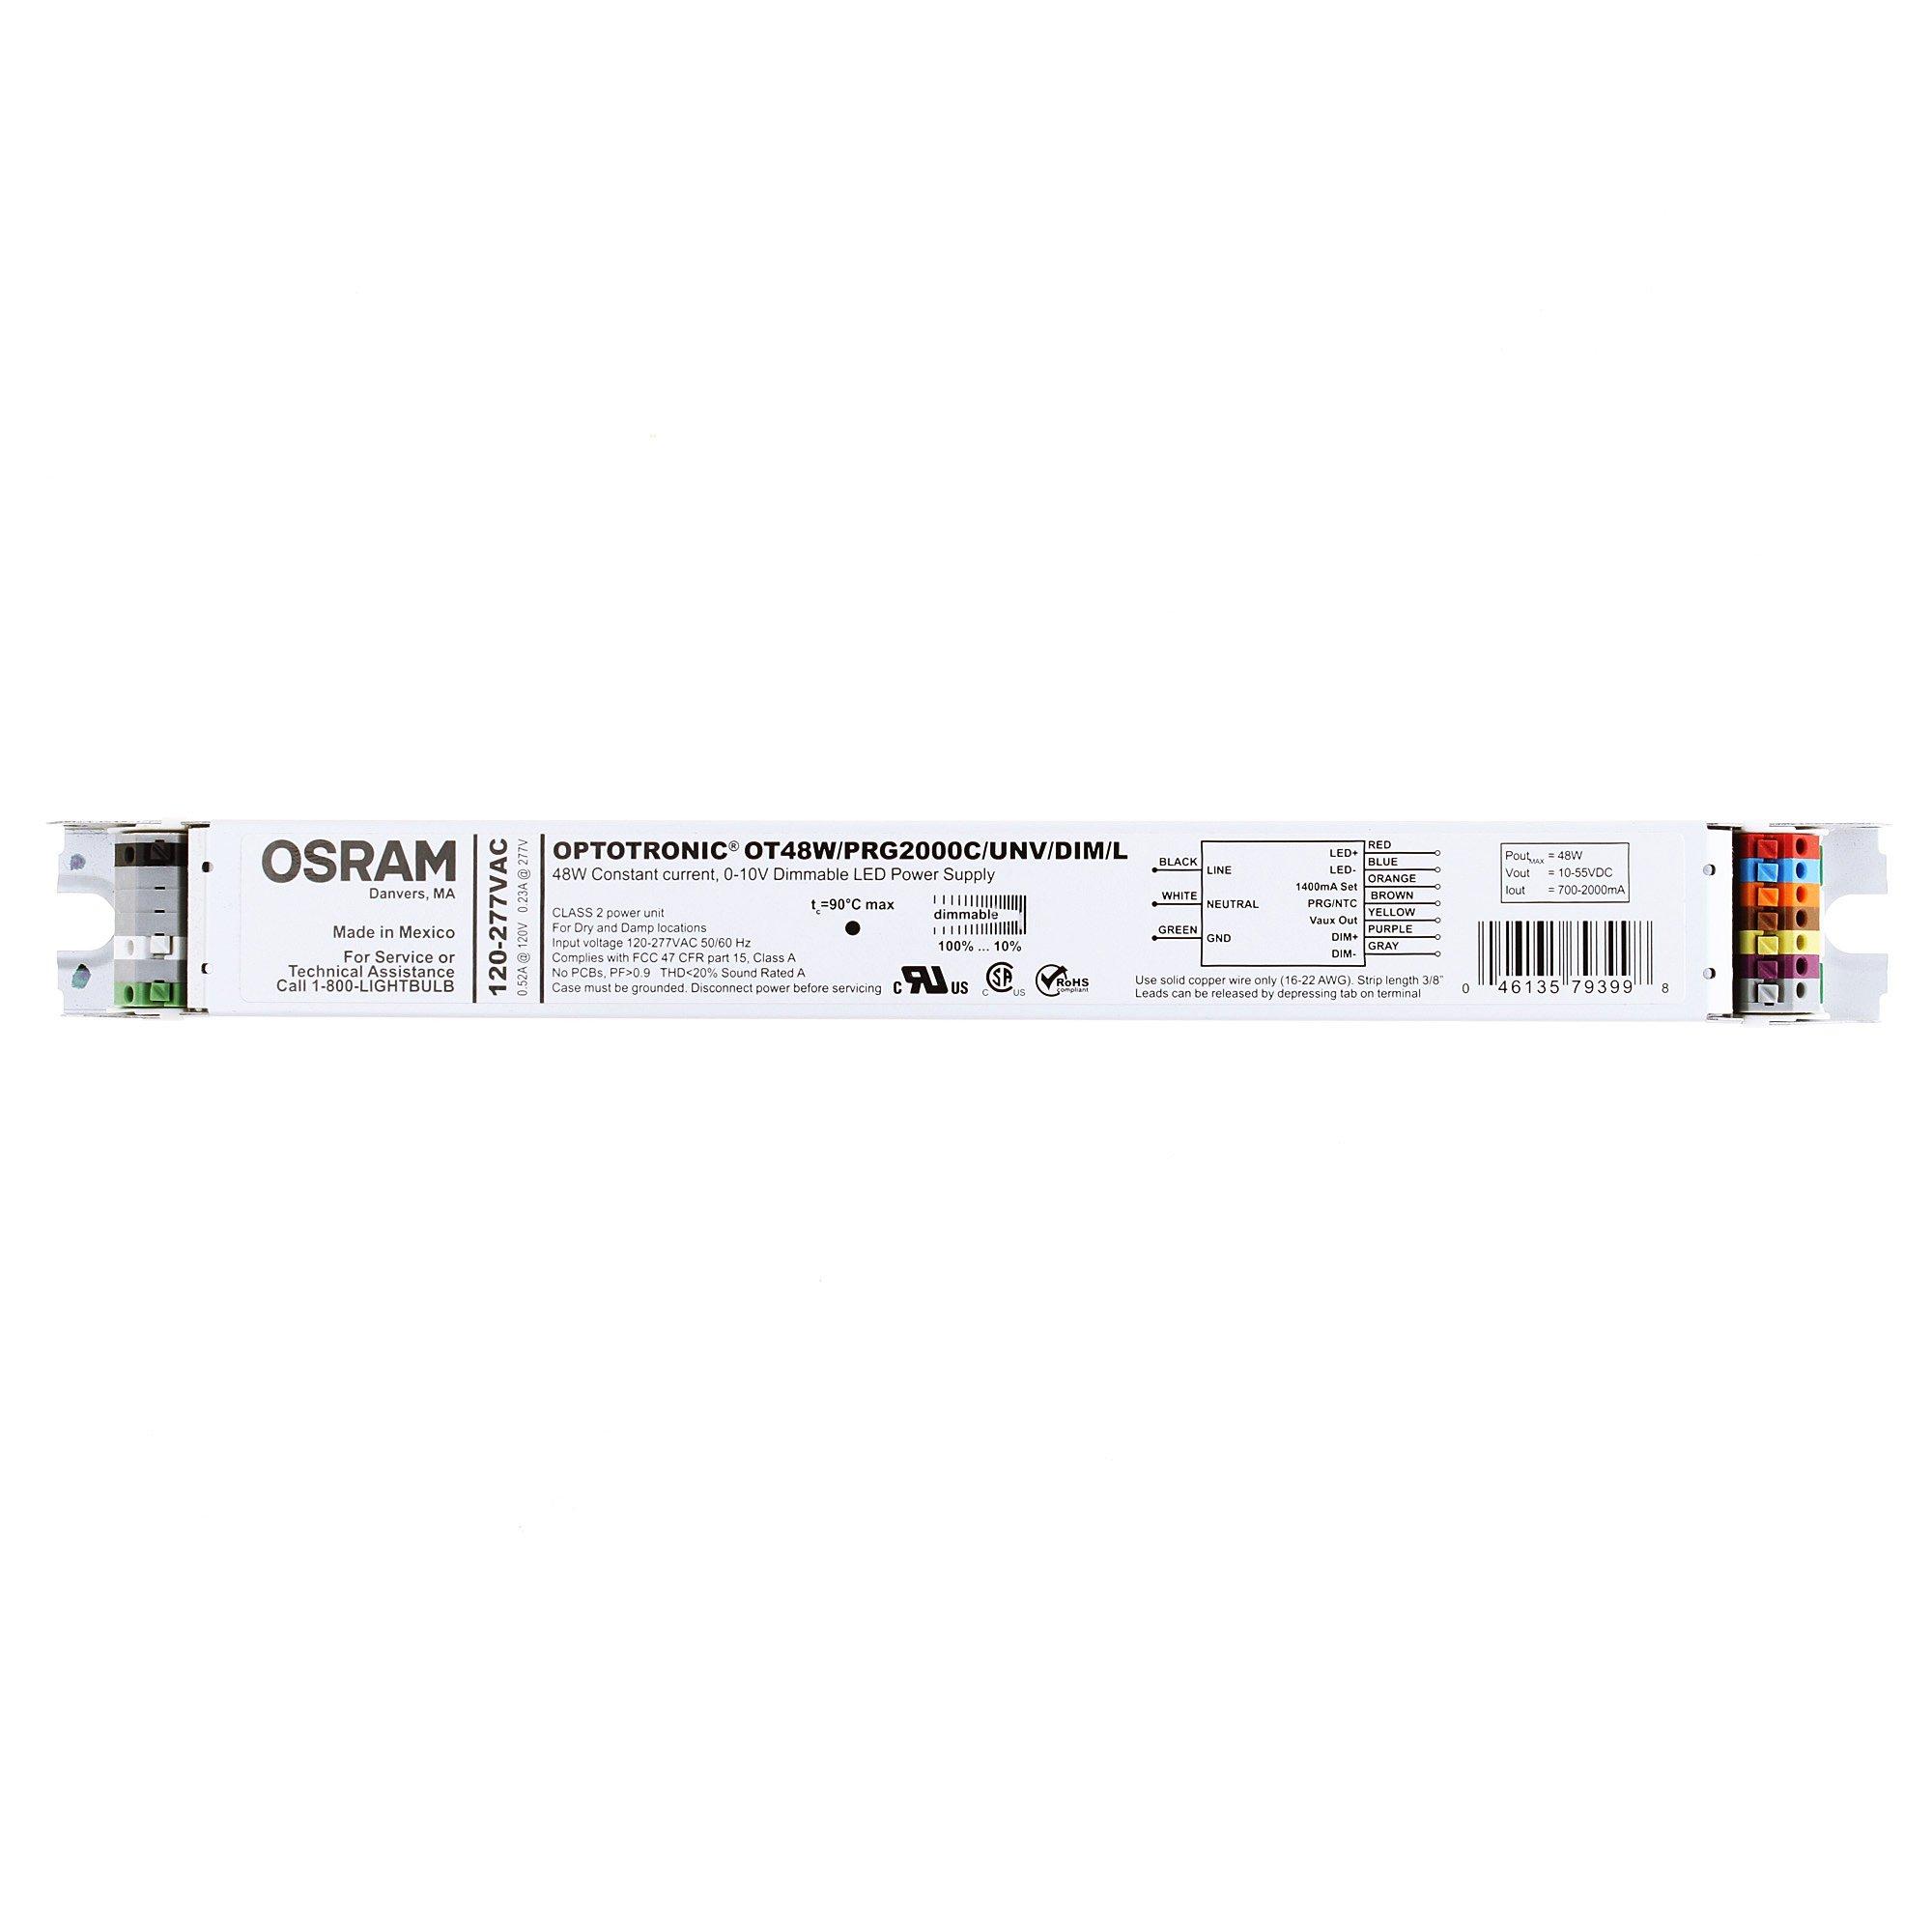 Sylvania 79399 - 48 Watt 120/277 Volt Dimmable LED Power Supply (OT48W/PRG2000C/UNV/DIM/L AUX)